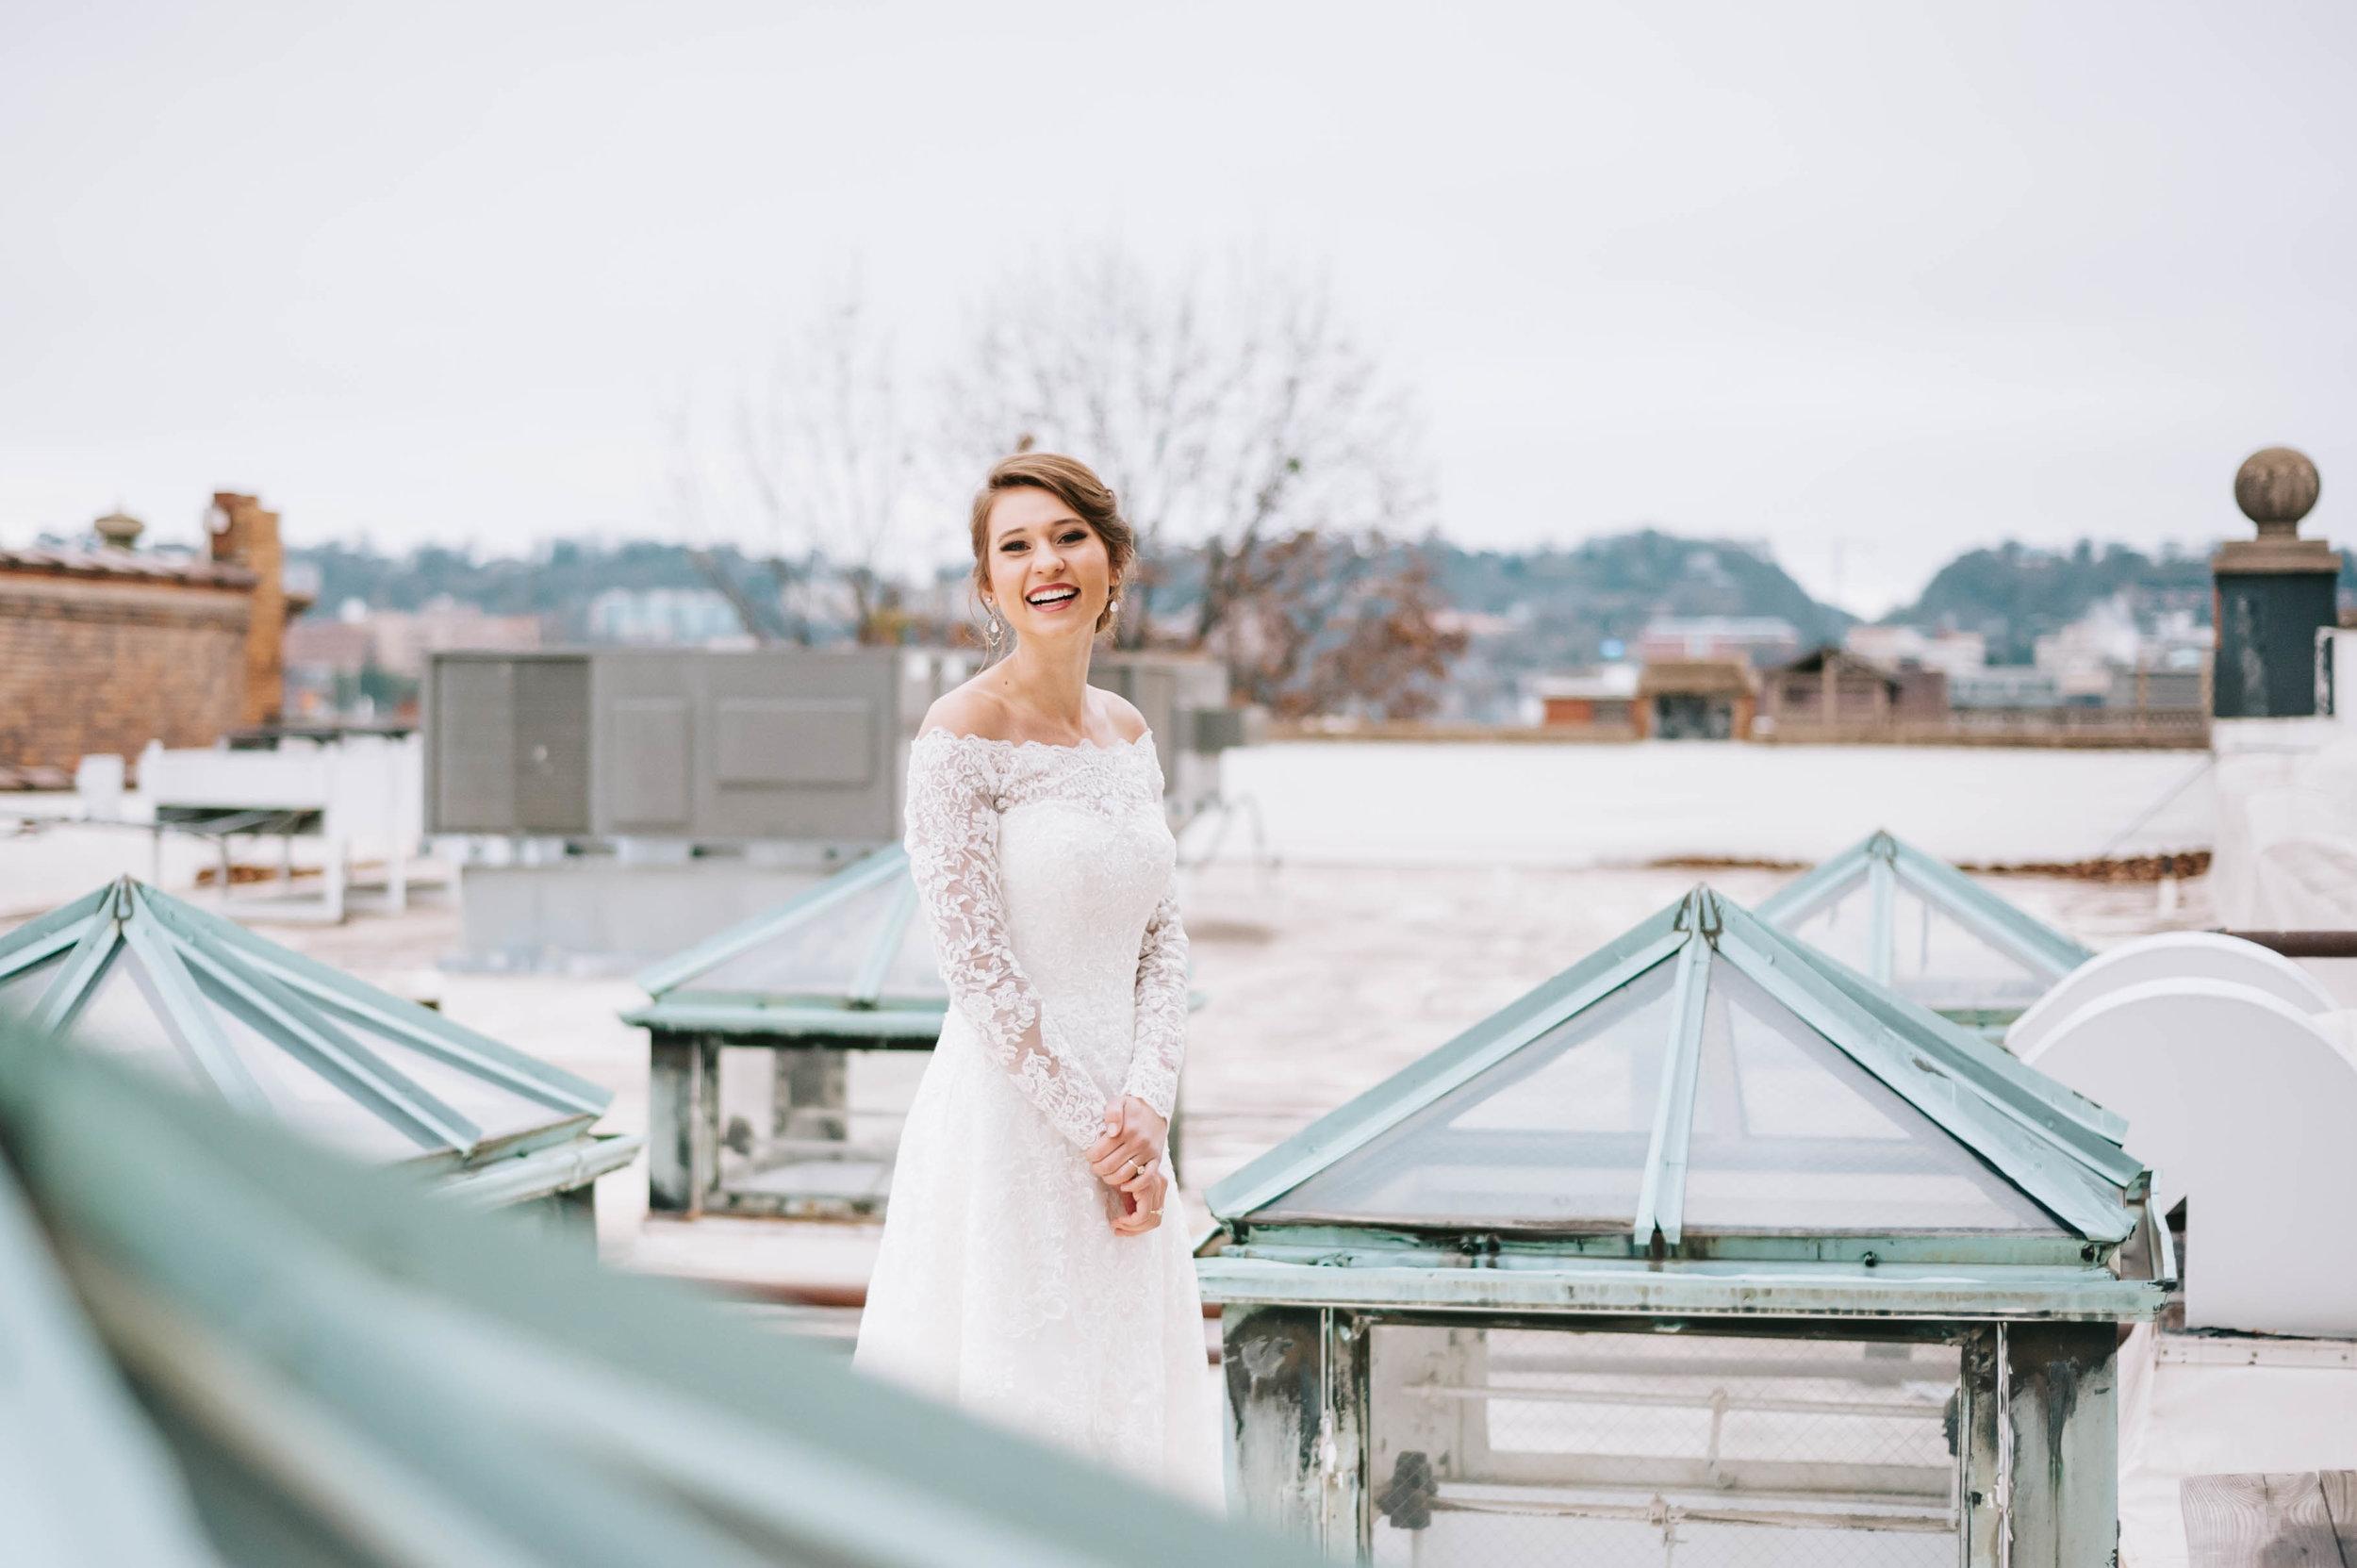 Hannah Steward Baskin | Bridals (57 of 74).jpg